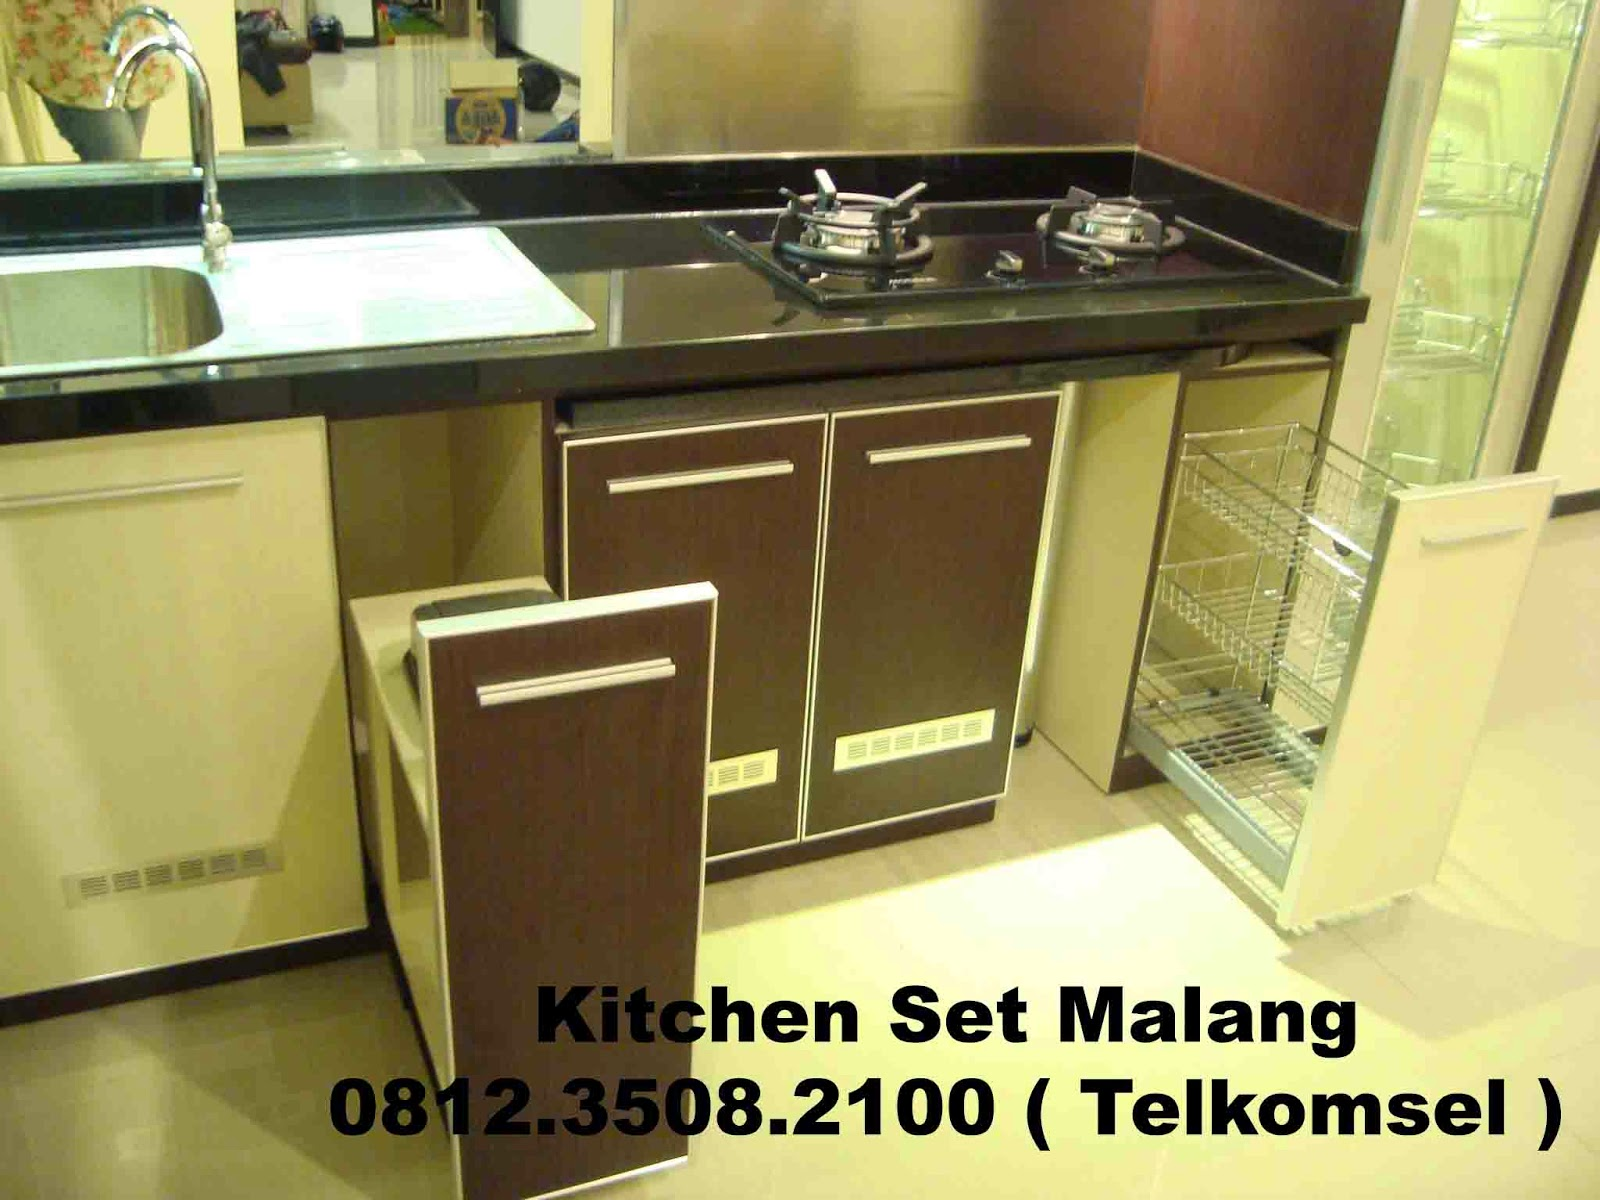 Kitchen set minimalis murah di malang harga kitchen set for Buat kitchen set murah